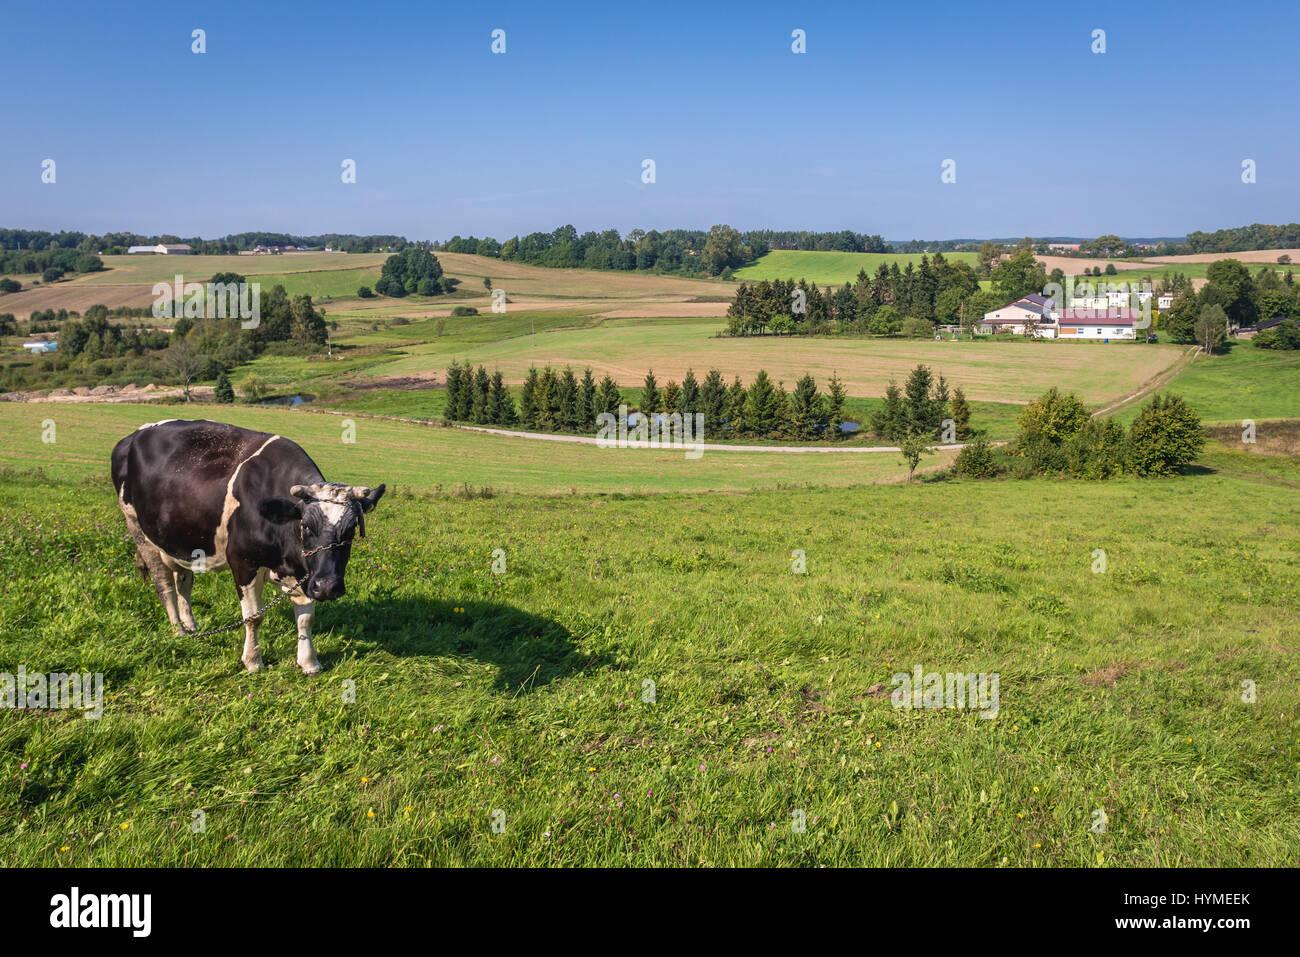 Cow on a pasturage in Kartuzy County, Kashubia region of Pomeranian Voivodeship in Poland - Stock Image